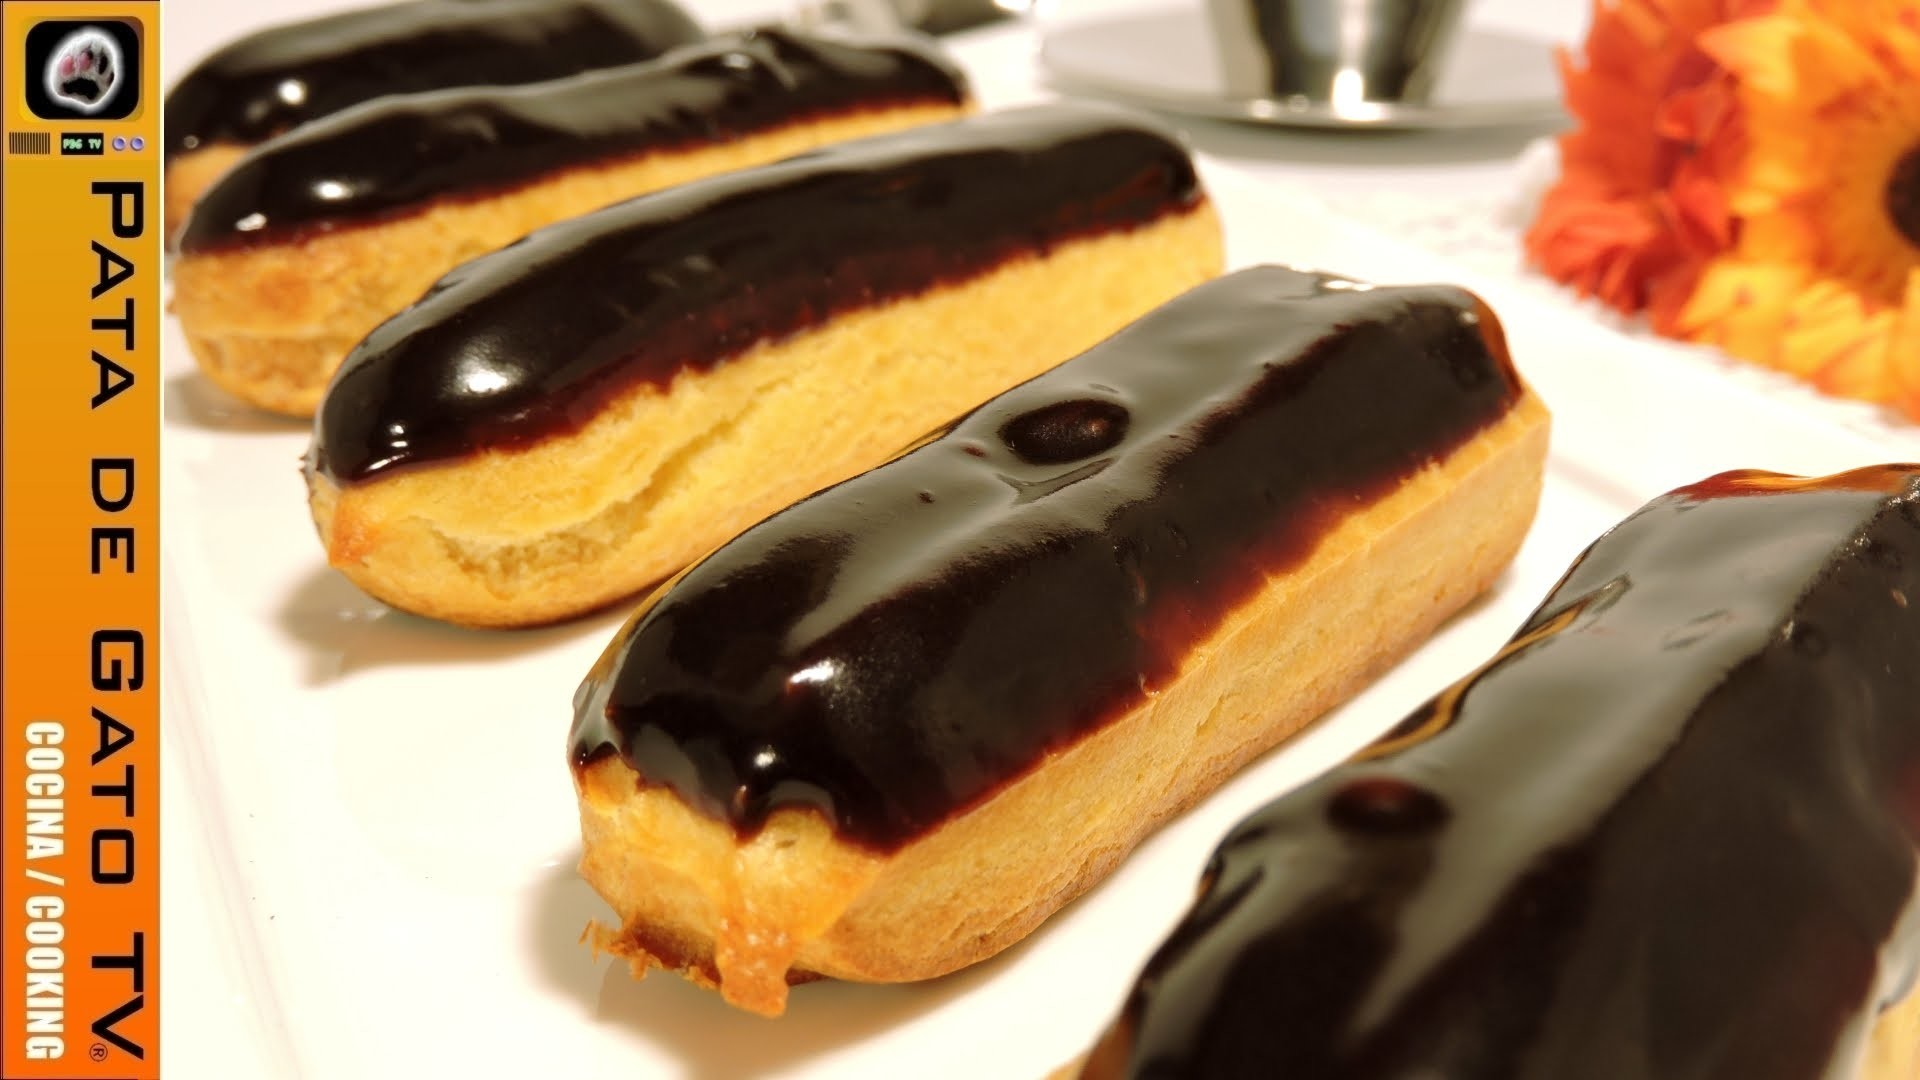 Éclairs rellenos de crema pastelera. Éclairs filled with pastry custard